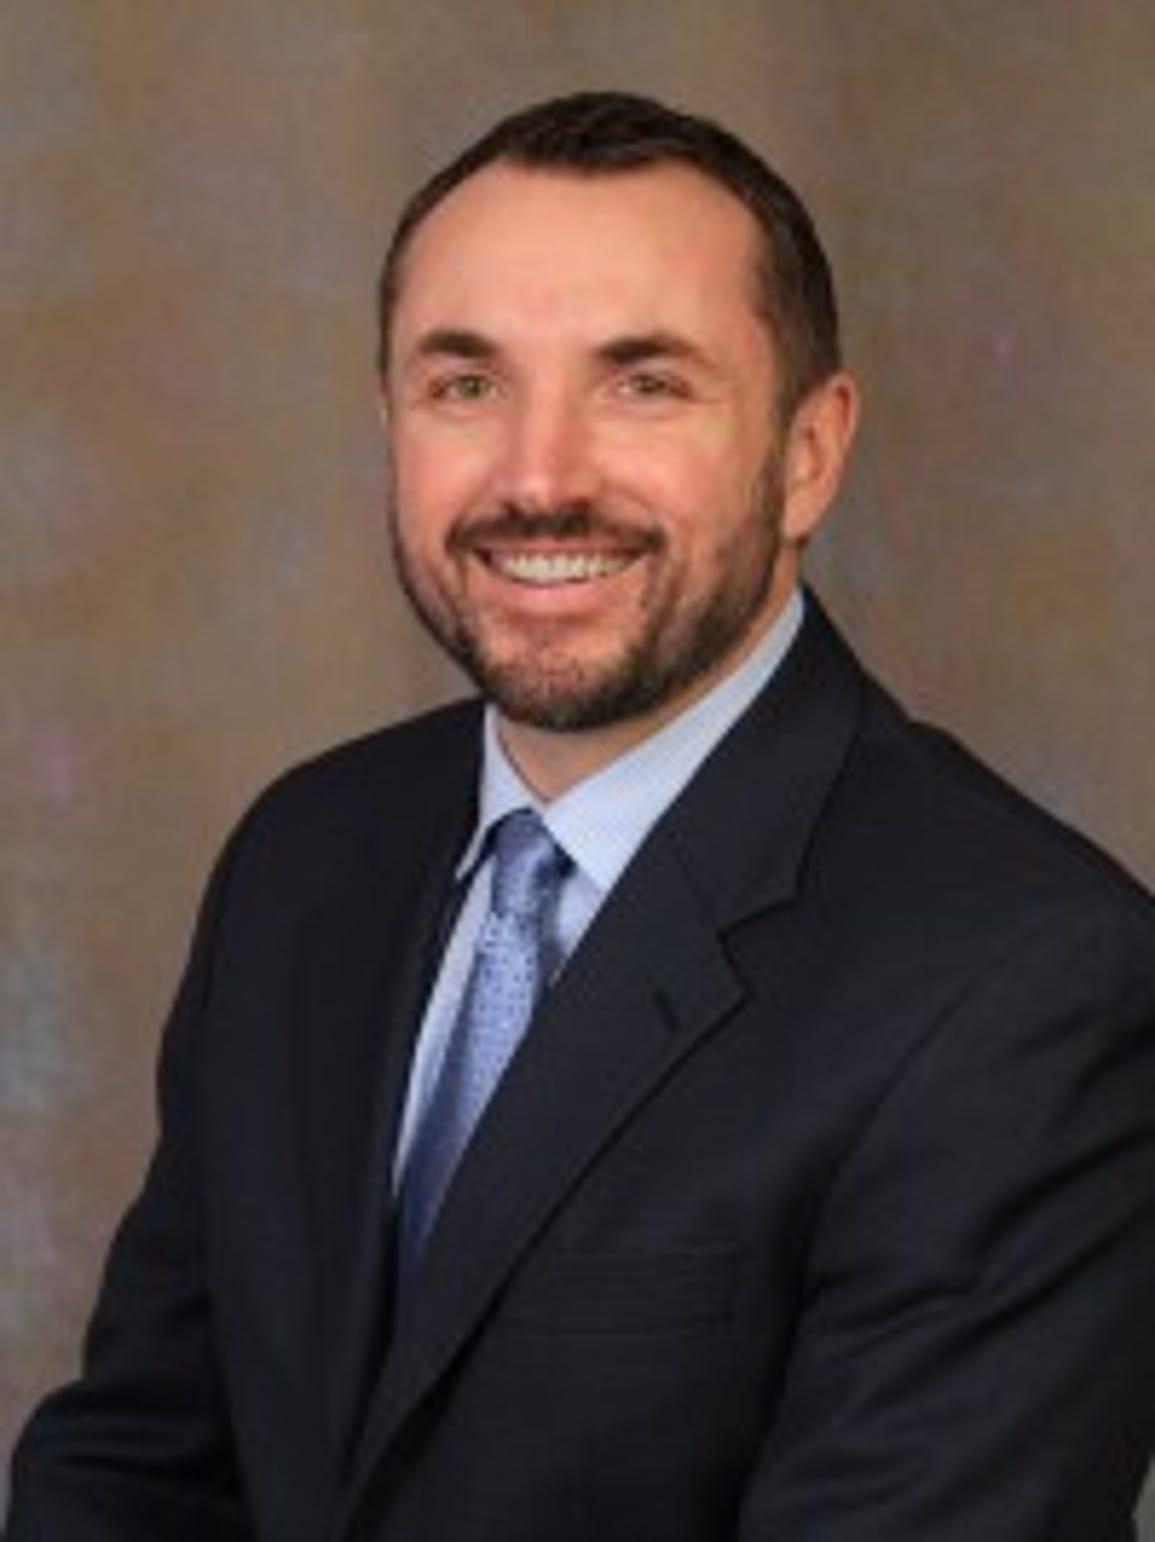 Thomas Lane, Dean of Students at Missouri State University